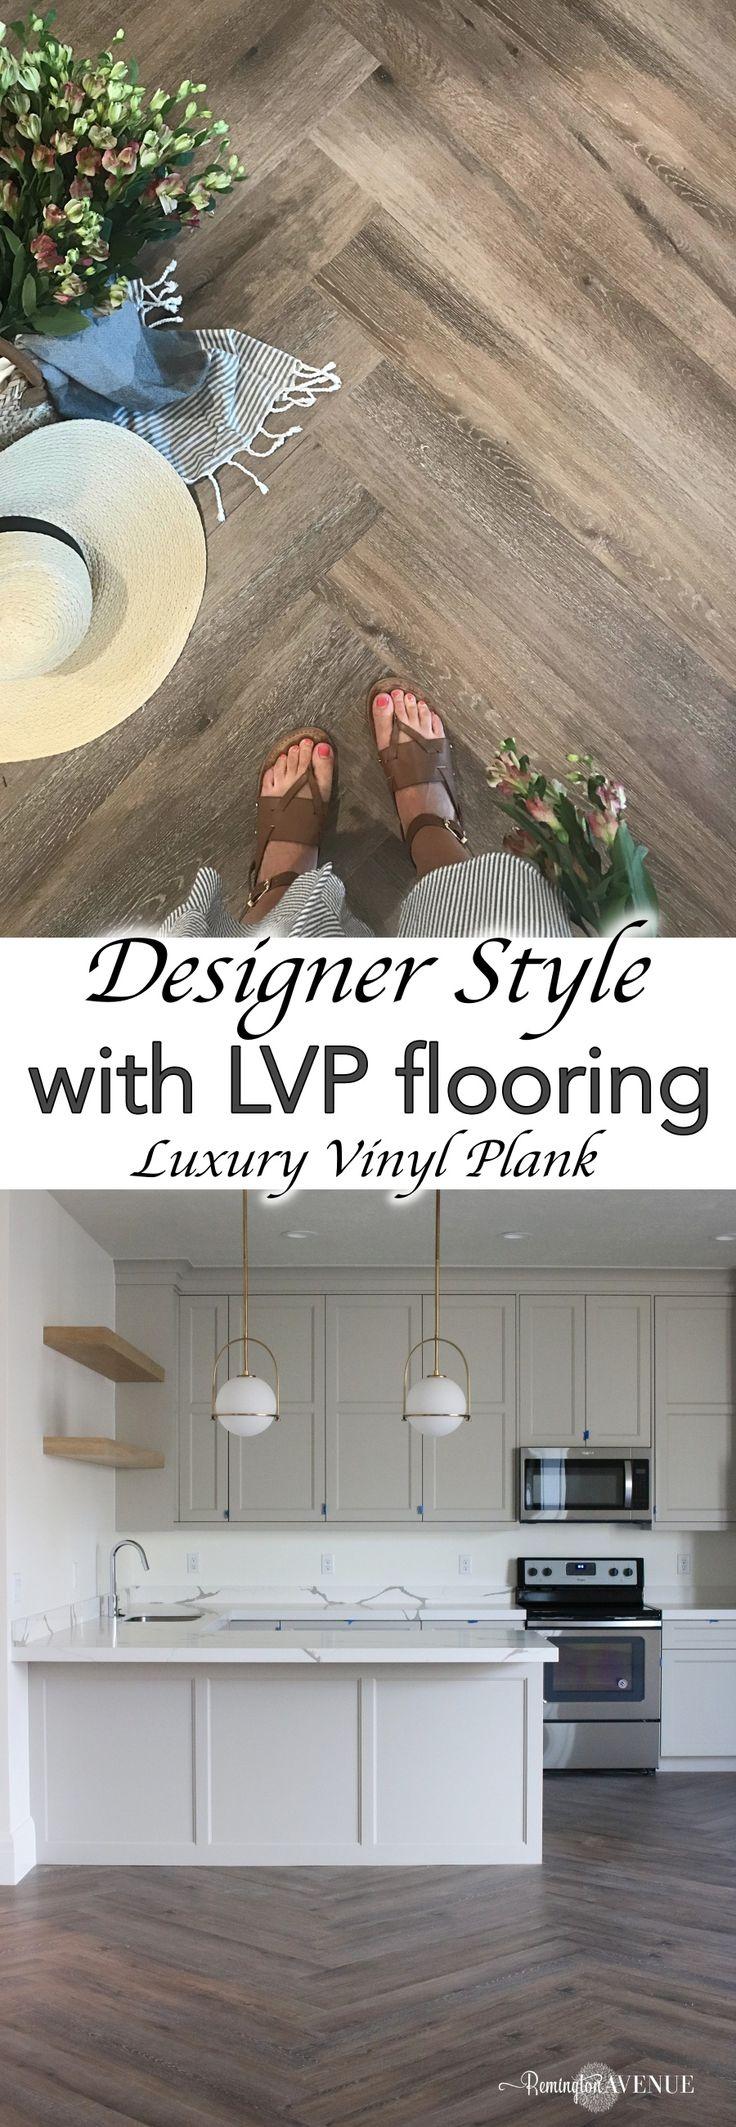 LVP Herringbone Floors & Basement Reveal (With images